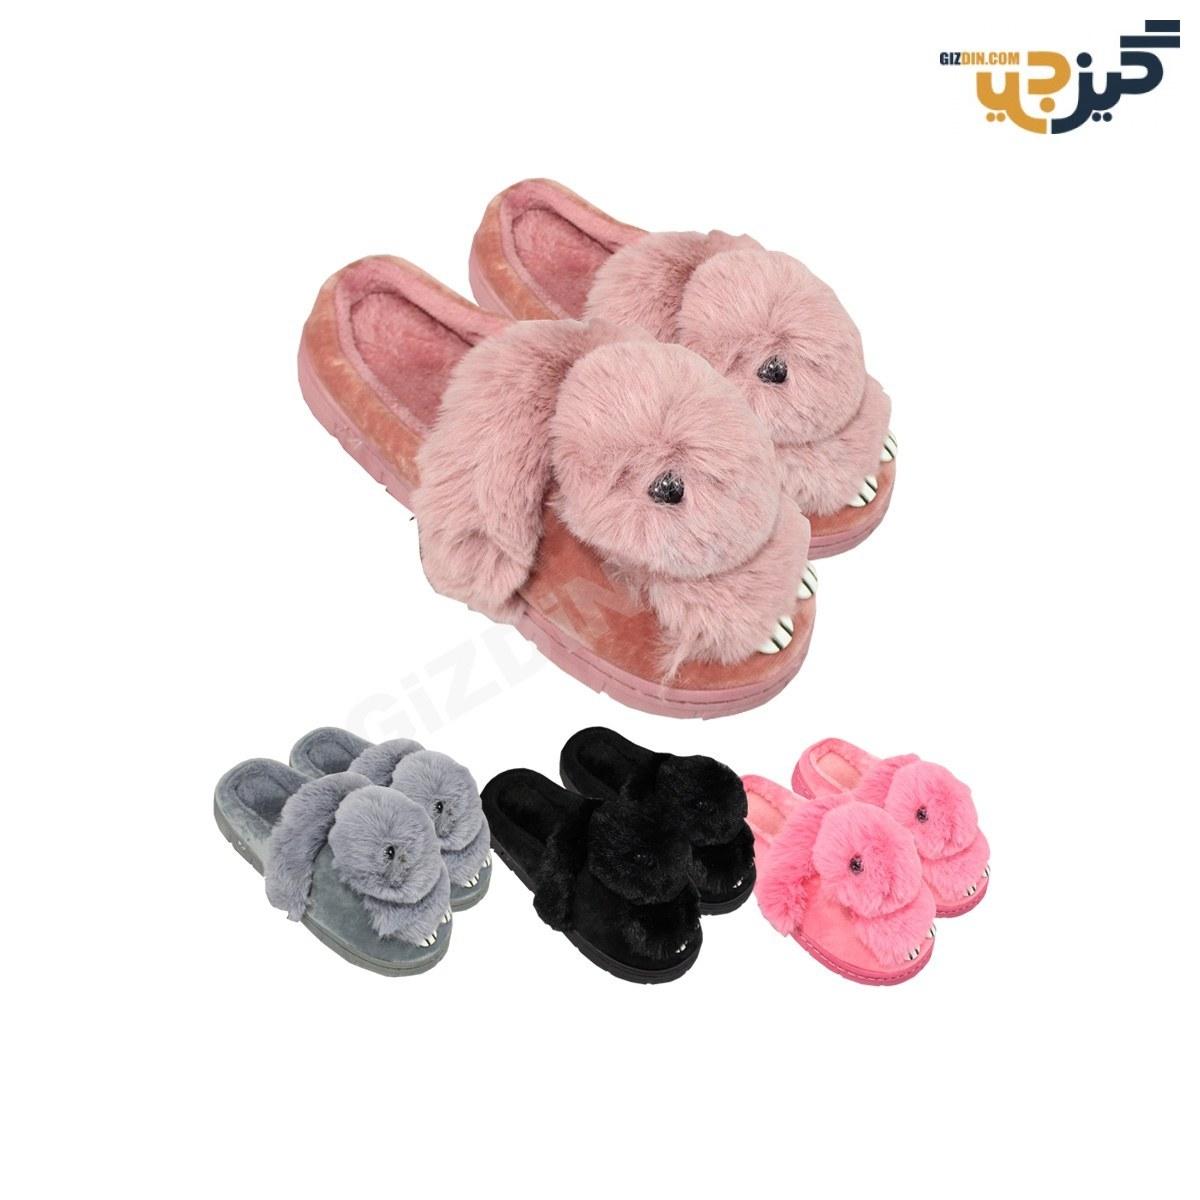 پاپوش طرح خرگوش پشمالو Family کد: p102-2 |